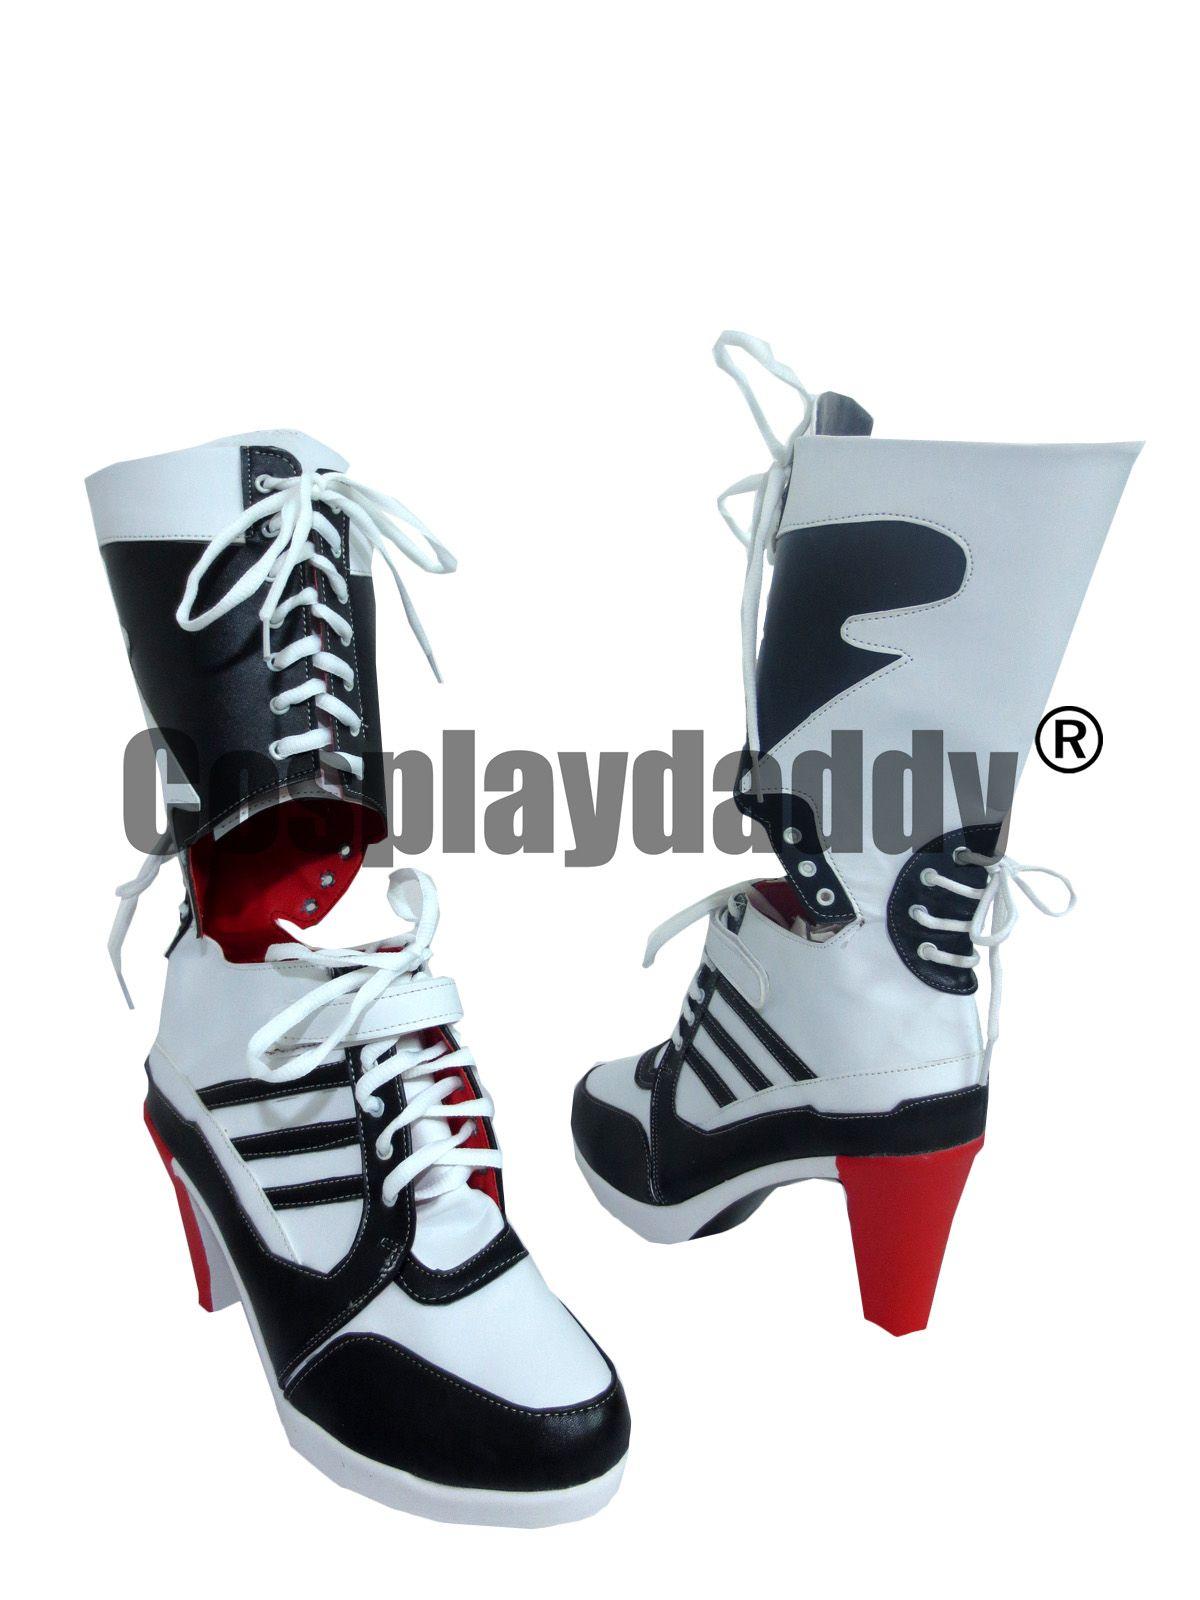 1bdc0b16ffa5 2019 Batman Harley Quinn Suicide Squad Halloween High Heels Cosplay Shoes  Boots From Timyuan2000